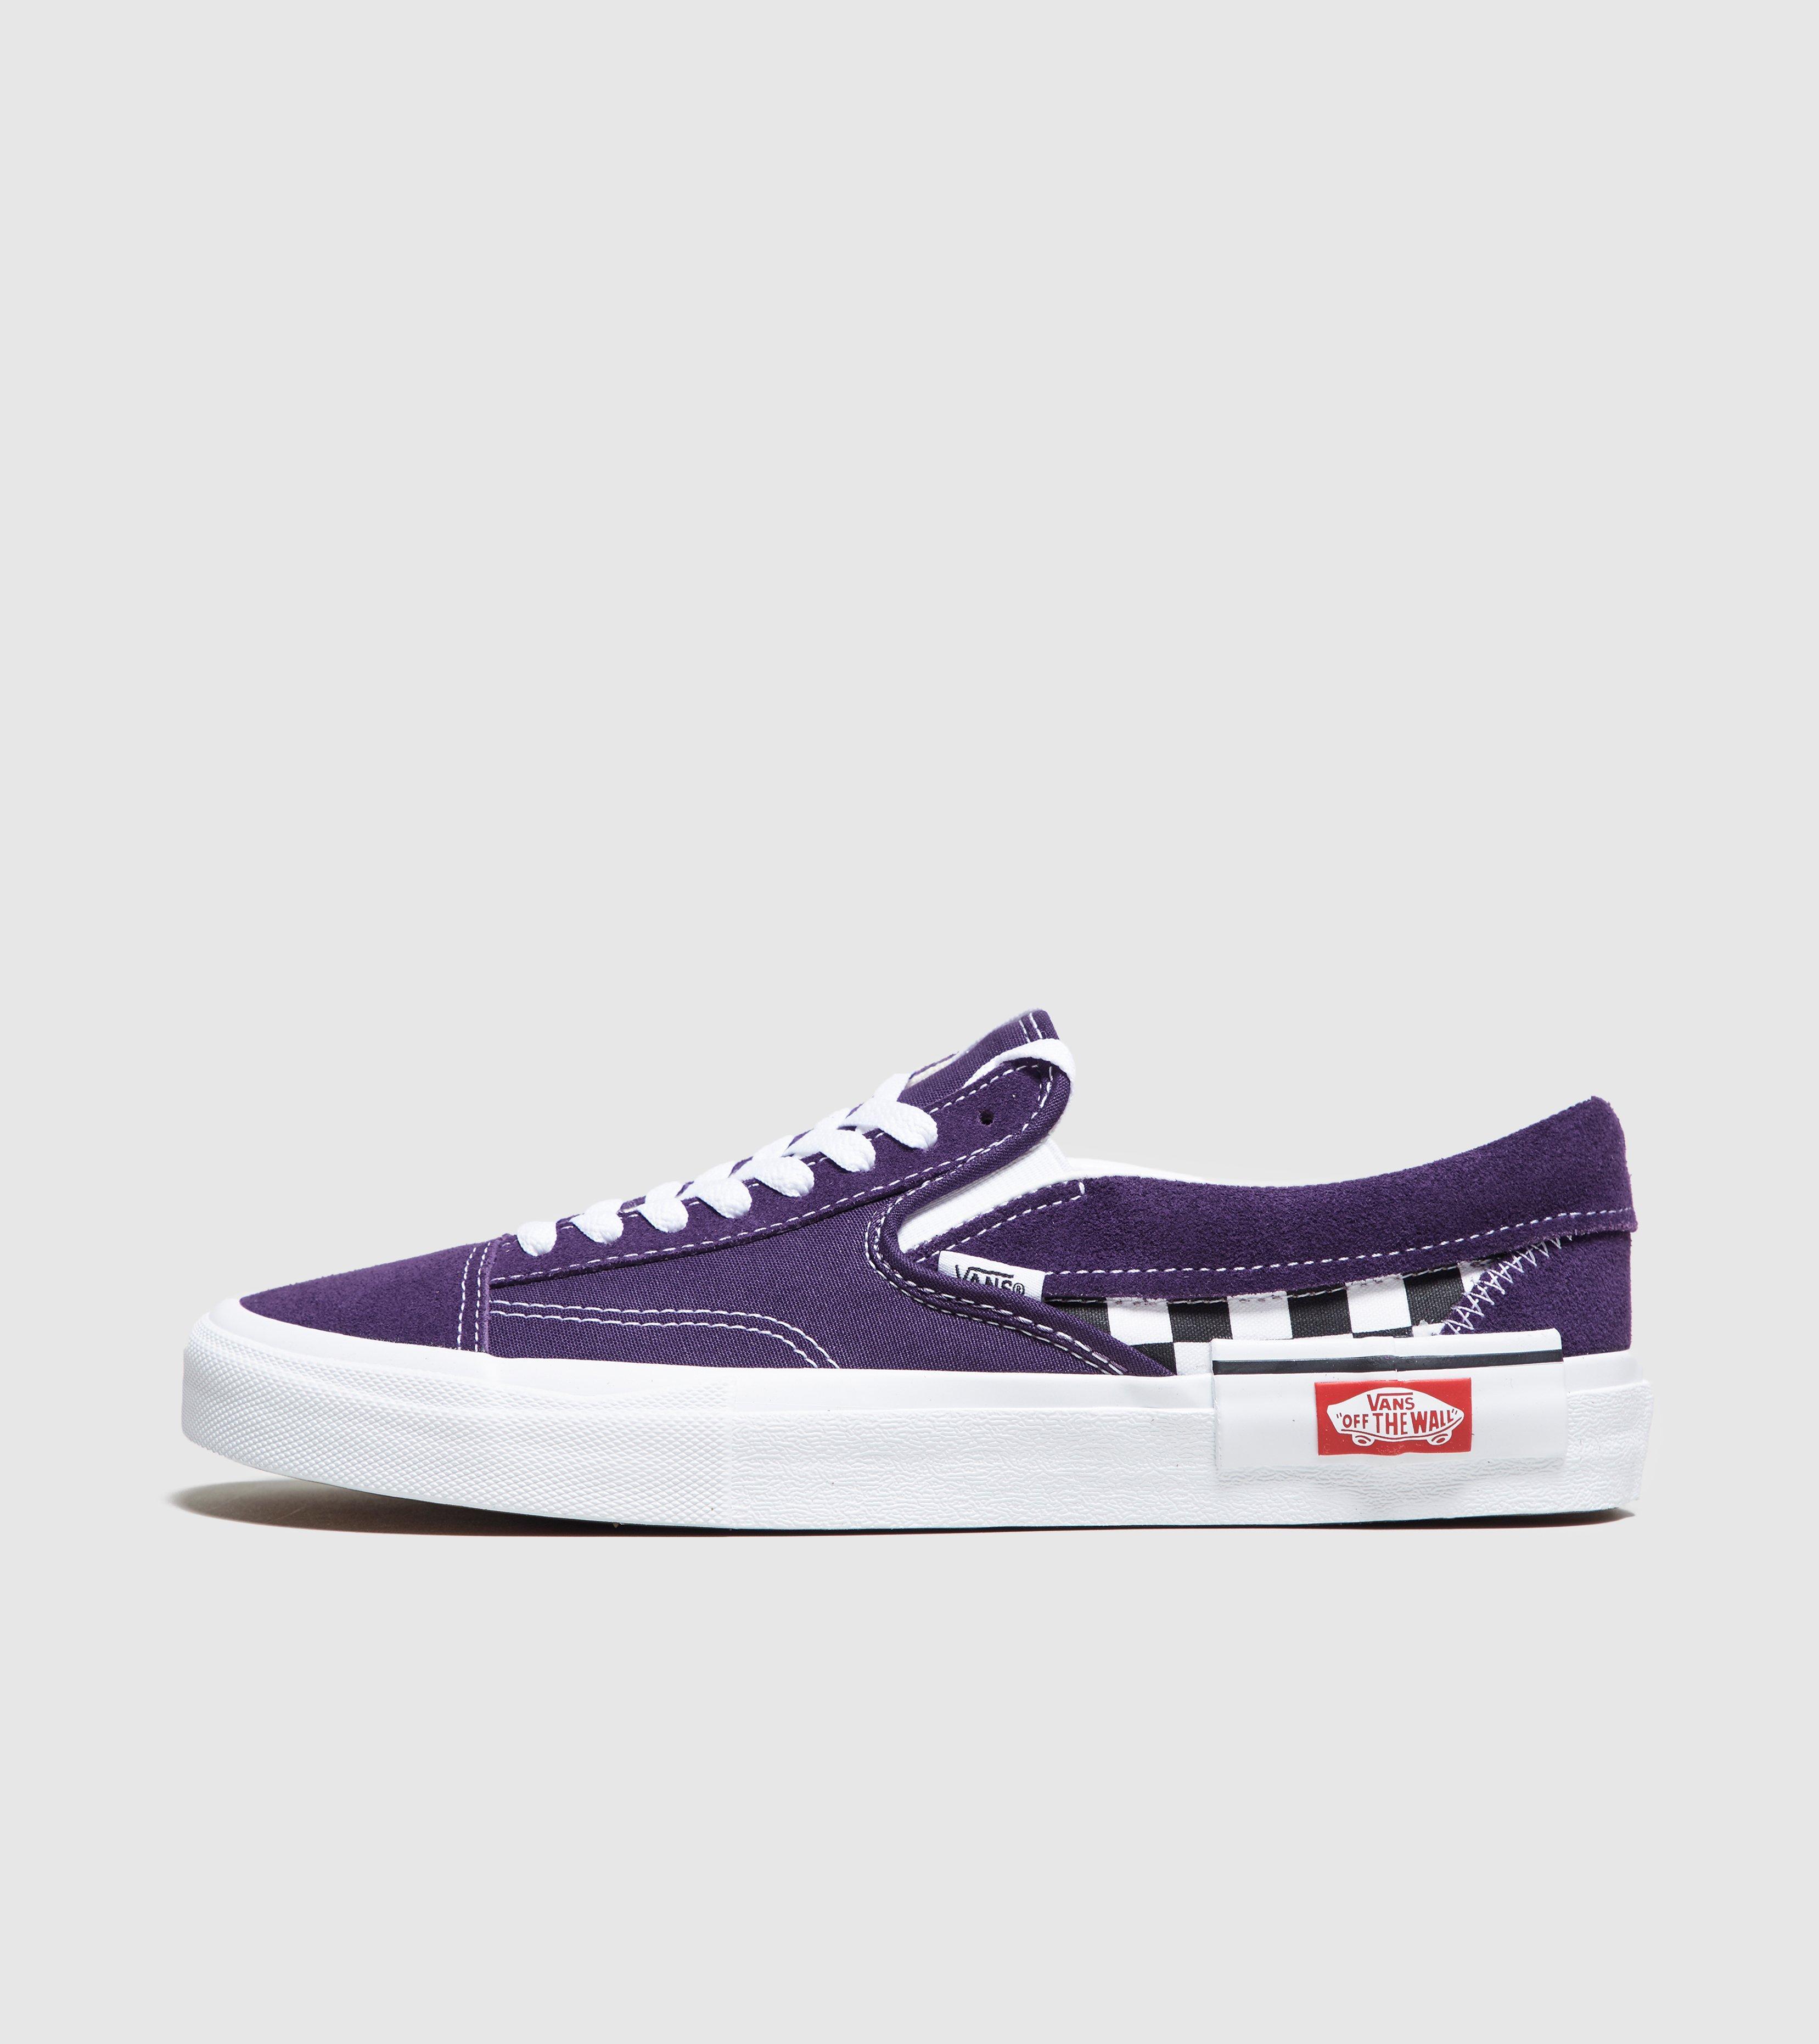 9562f92fa50 Lyst - Vans Slip-on Cap Checkerboard In Mysterioso in Purple for Men ...